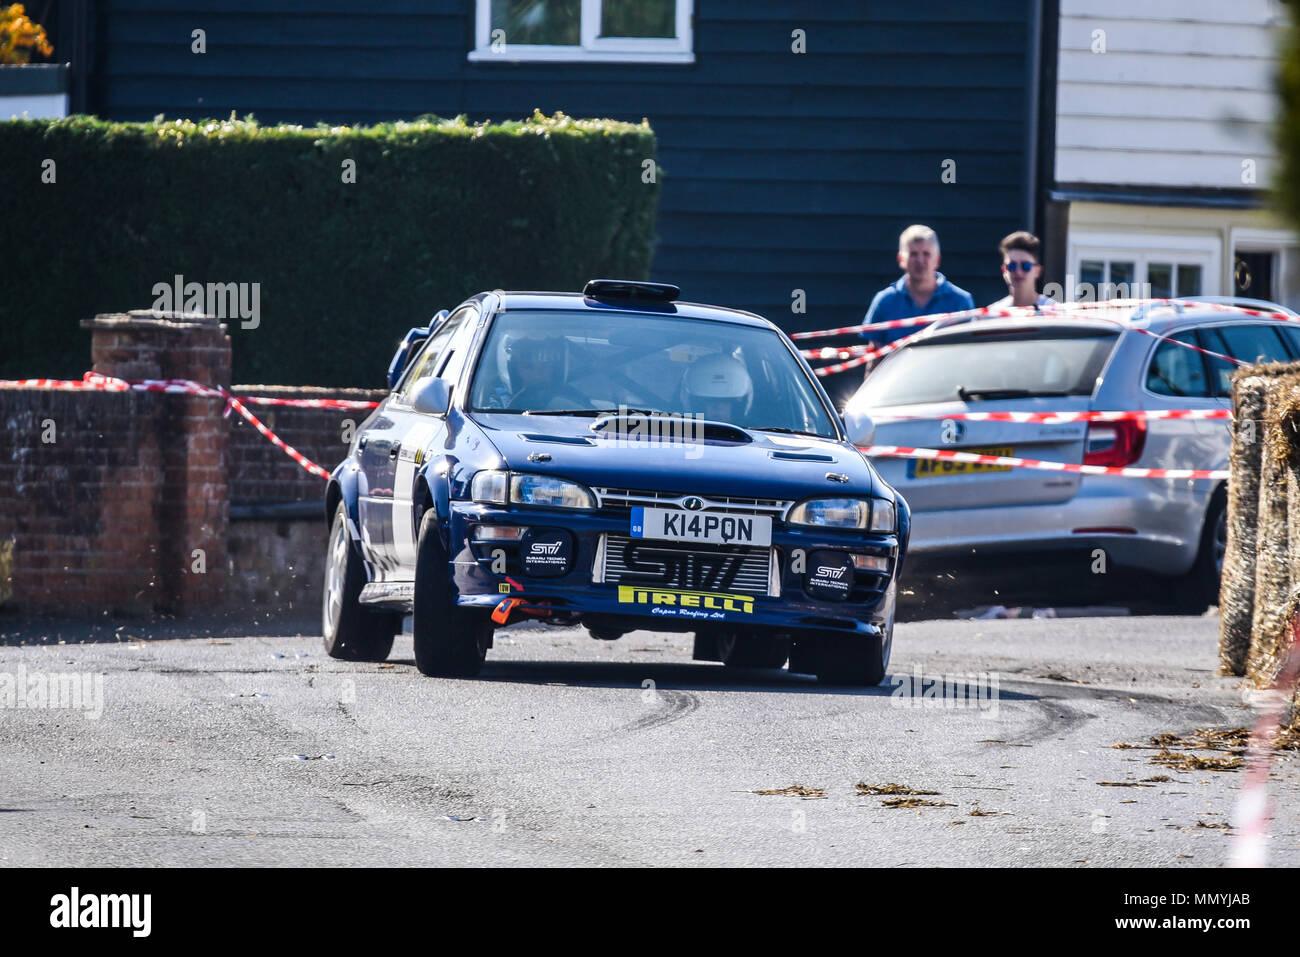 Tony Capon driver Teresa Butler co driver racing Subaru Impreza in the closed public road Corbeau Seats car Rally Tendring and Clacton, Essex, UK - Stock Image